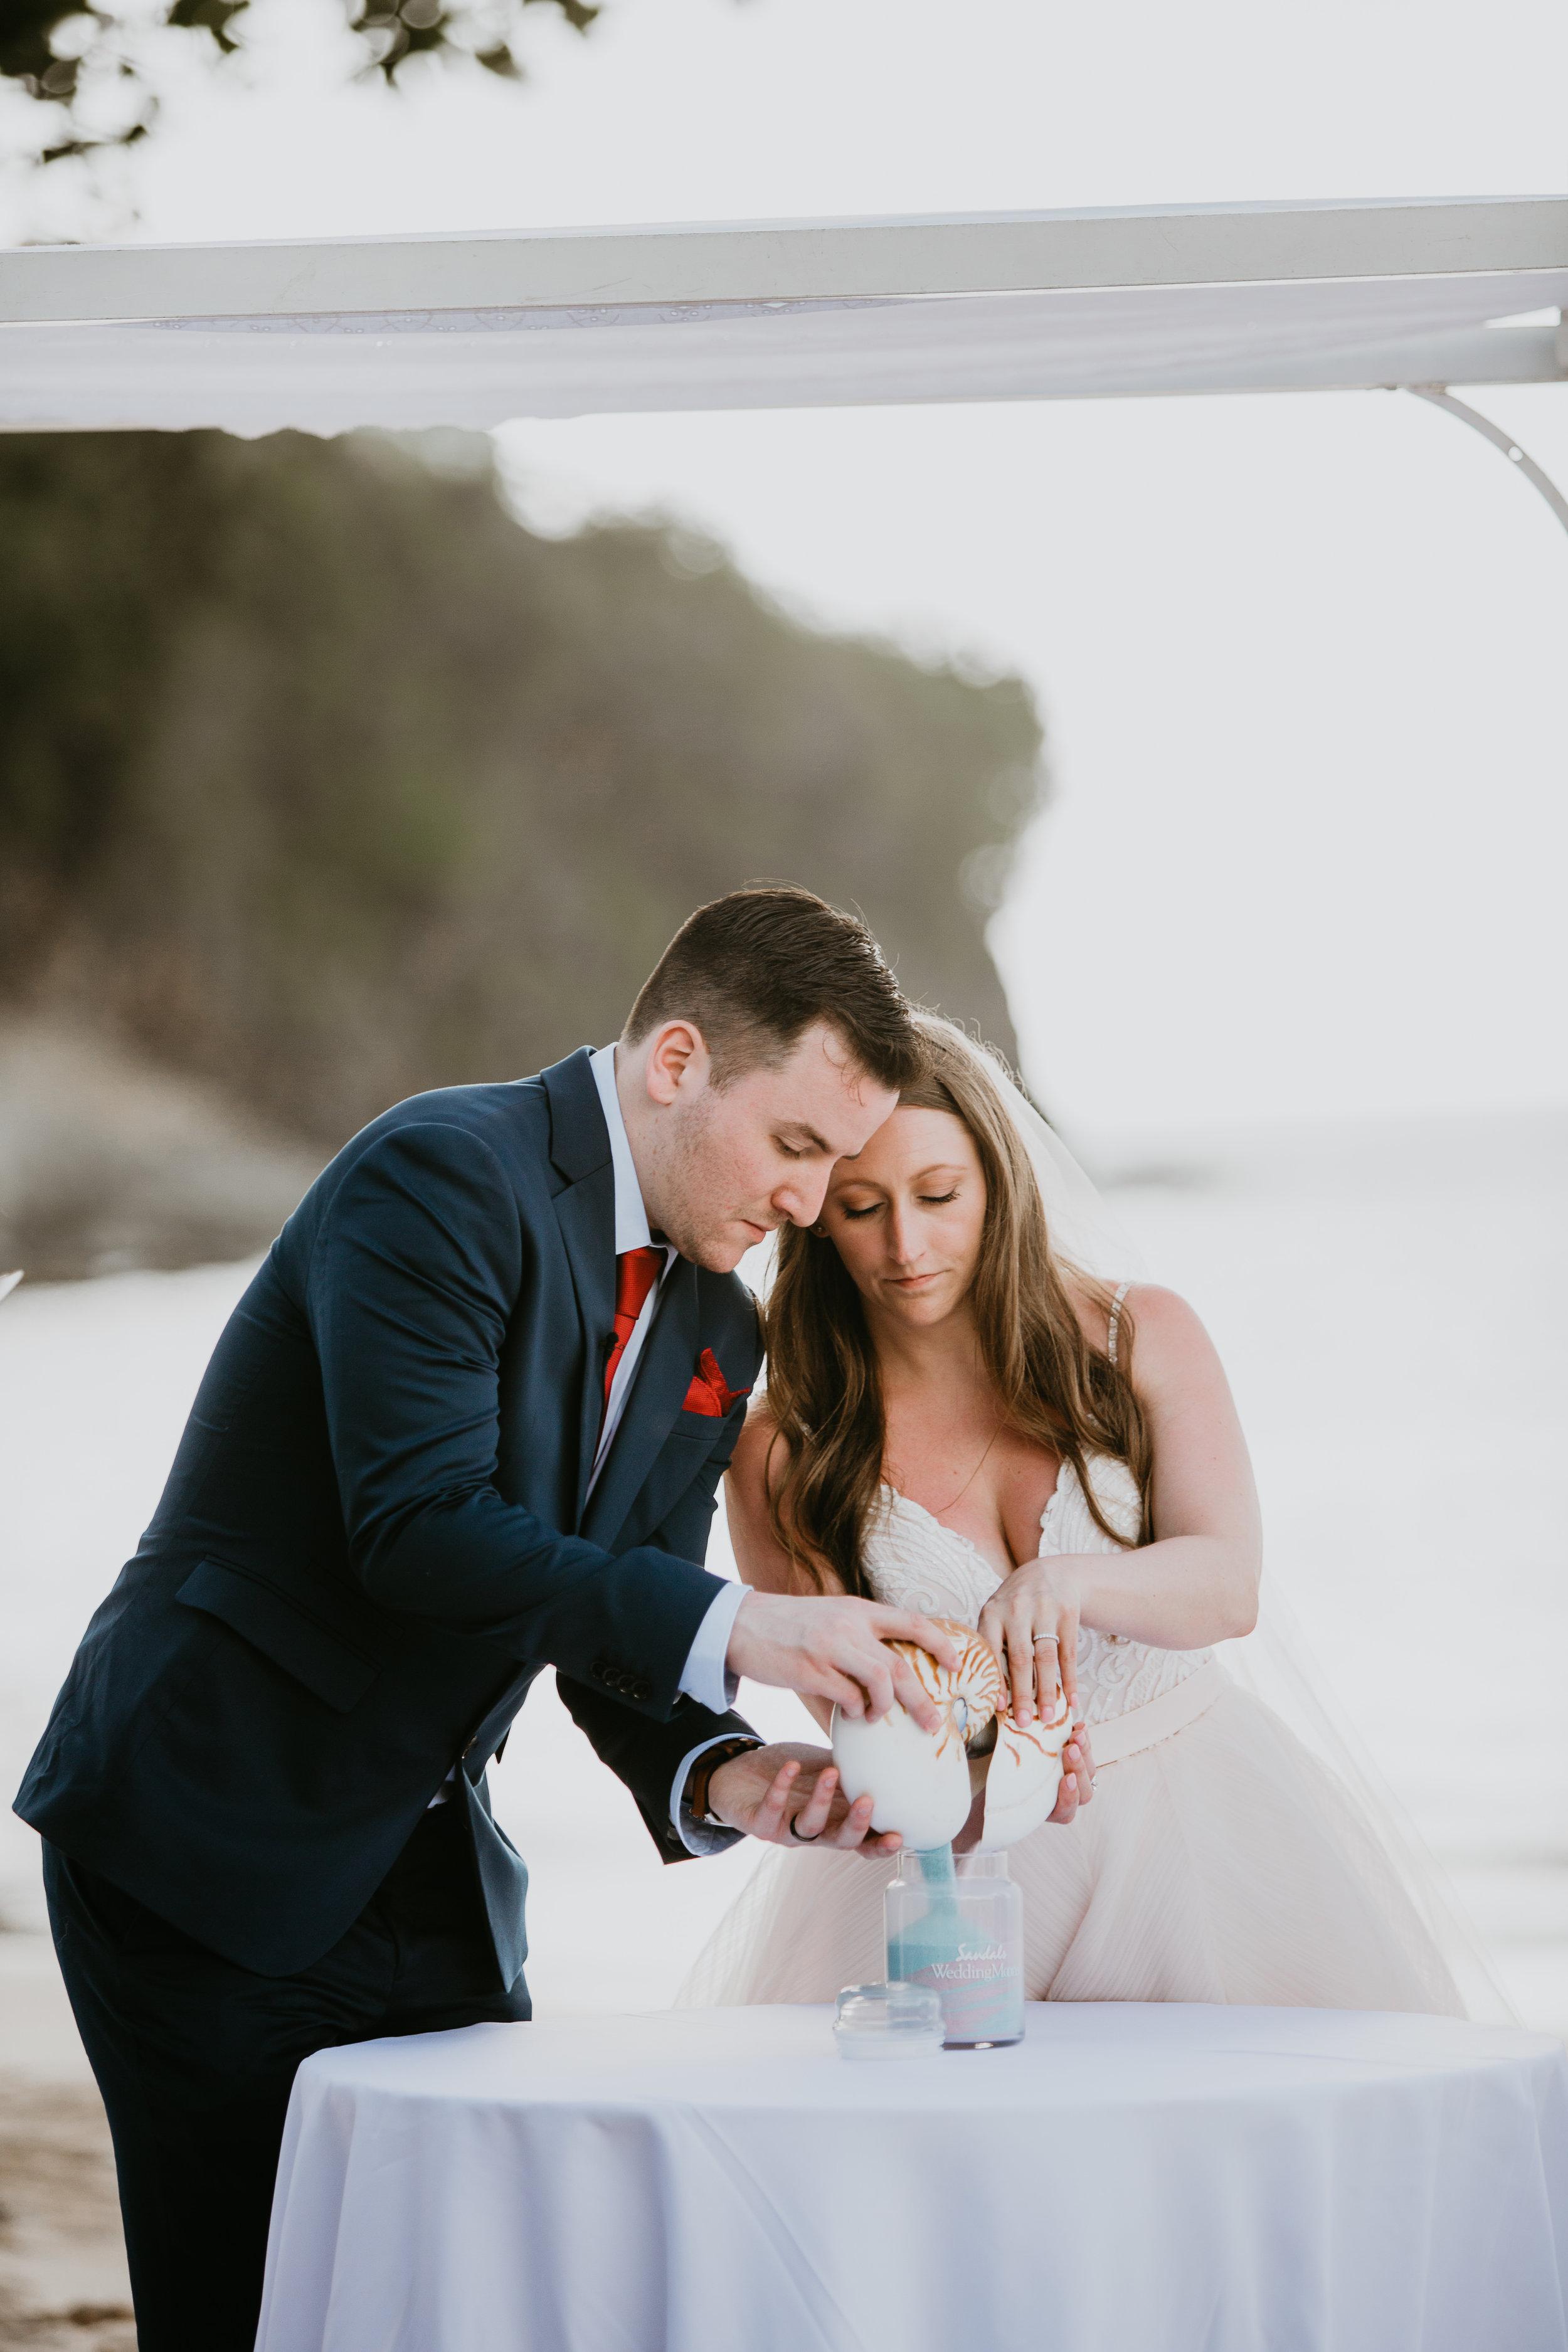 nicole-daacke-photography-destination-wedding-in-st-lucia-sandals-la-toc-intimate-island-wedding-carribean-elopement-photographer-chill-island-wedding-71.jpg